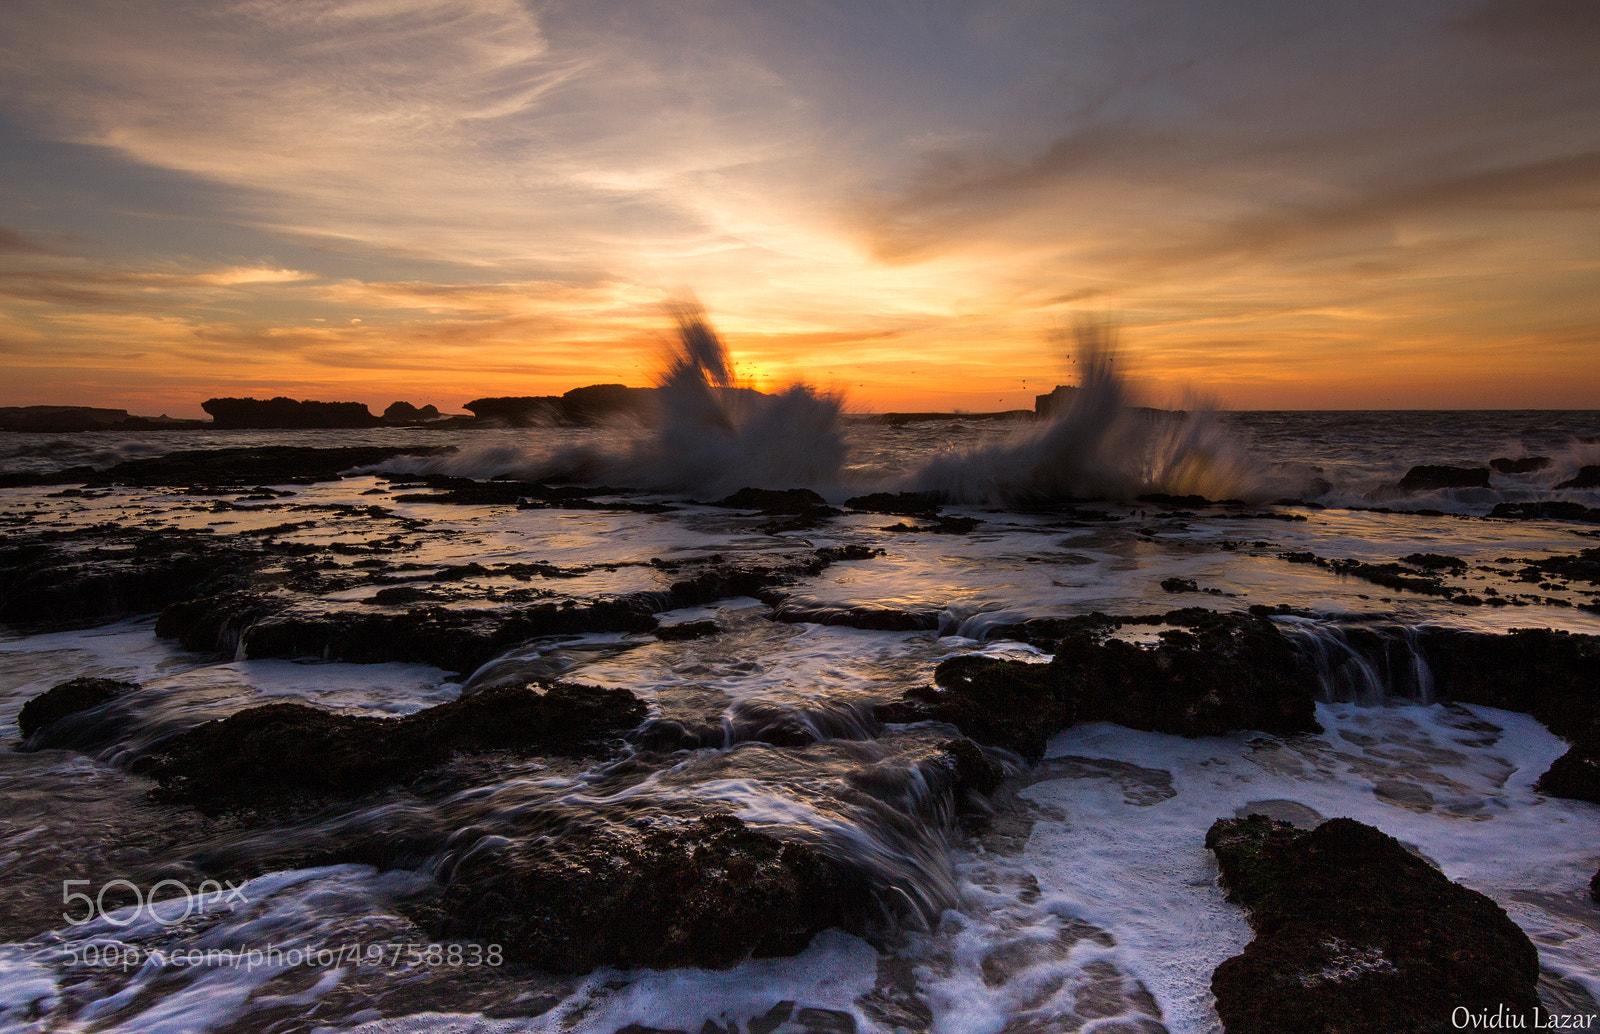 Photograph sunset at Essaquira by Lazar Ovidiu on 500px